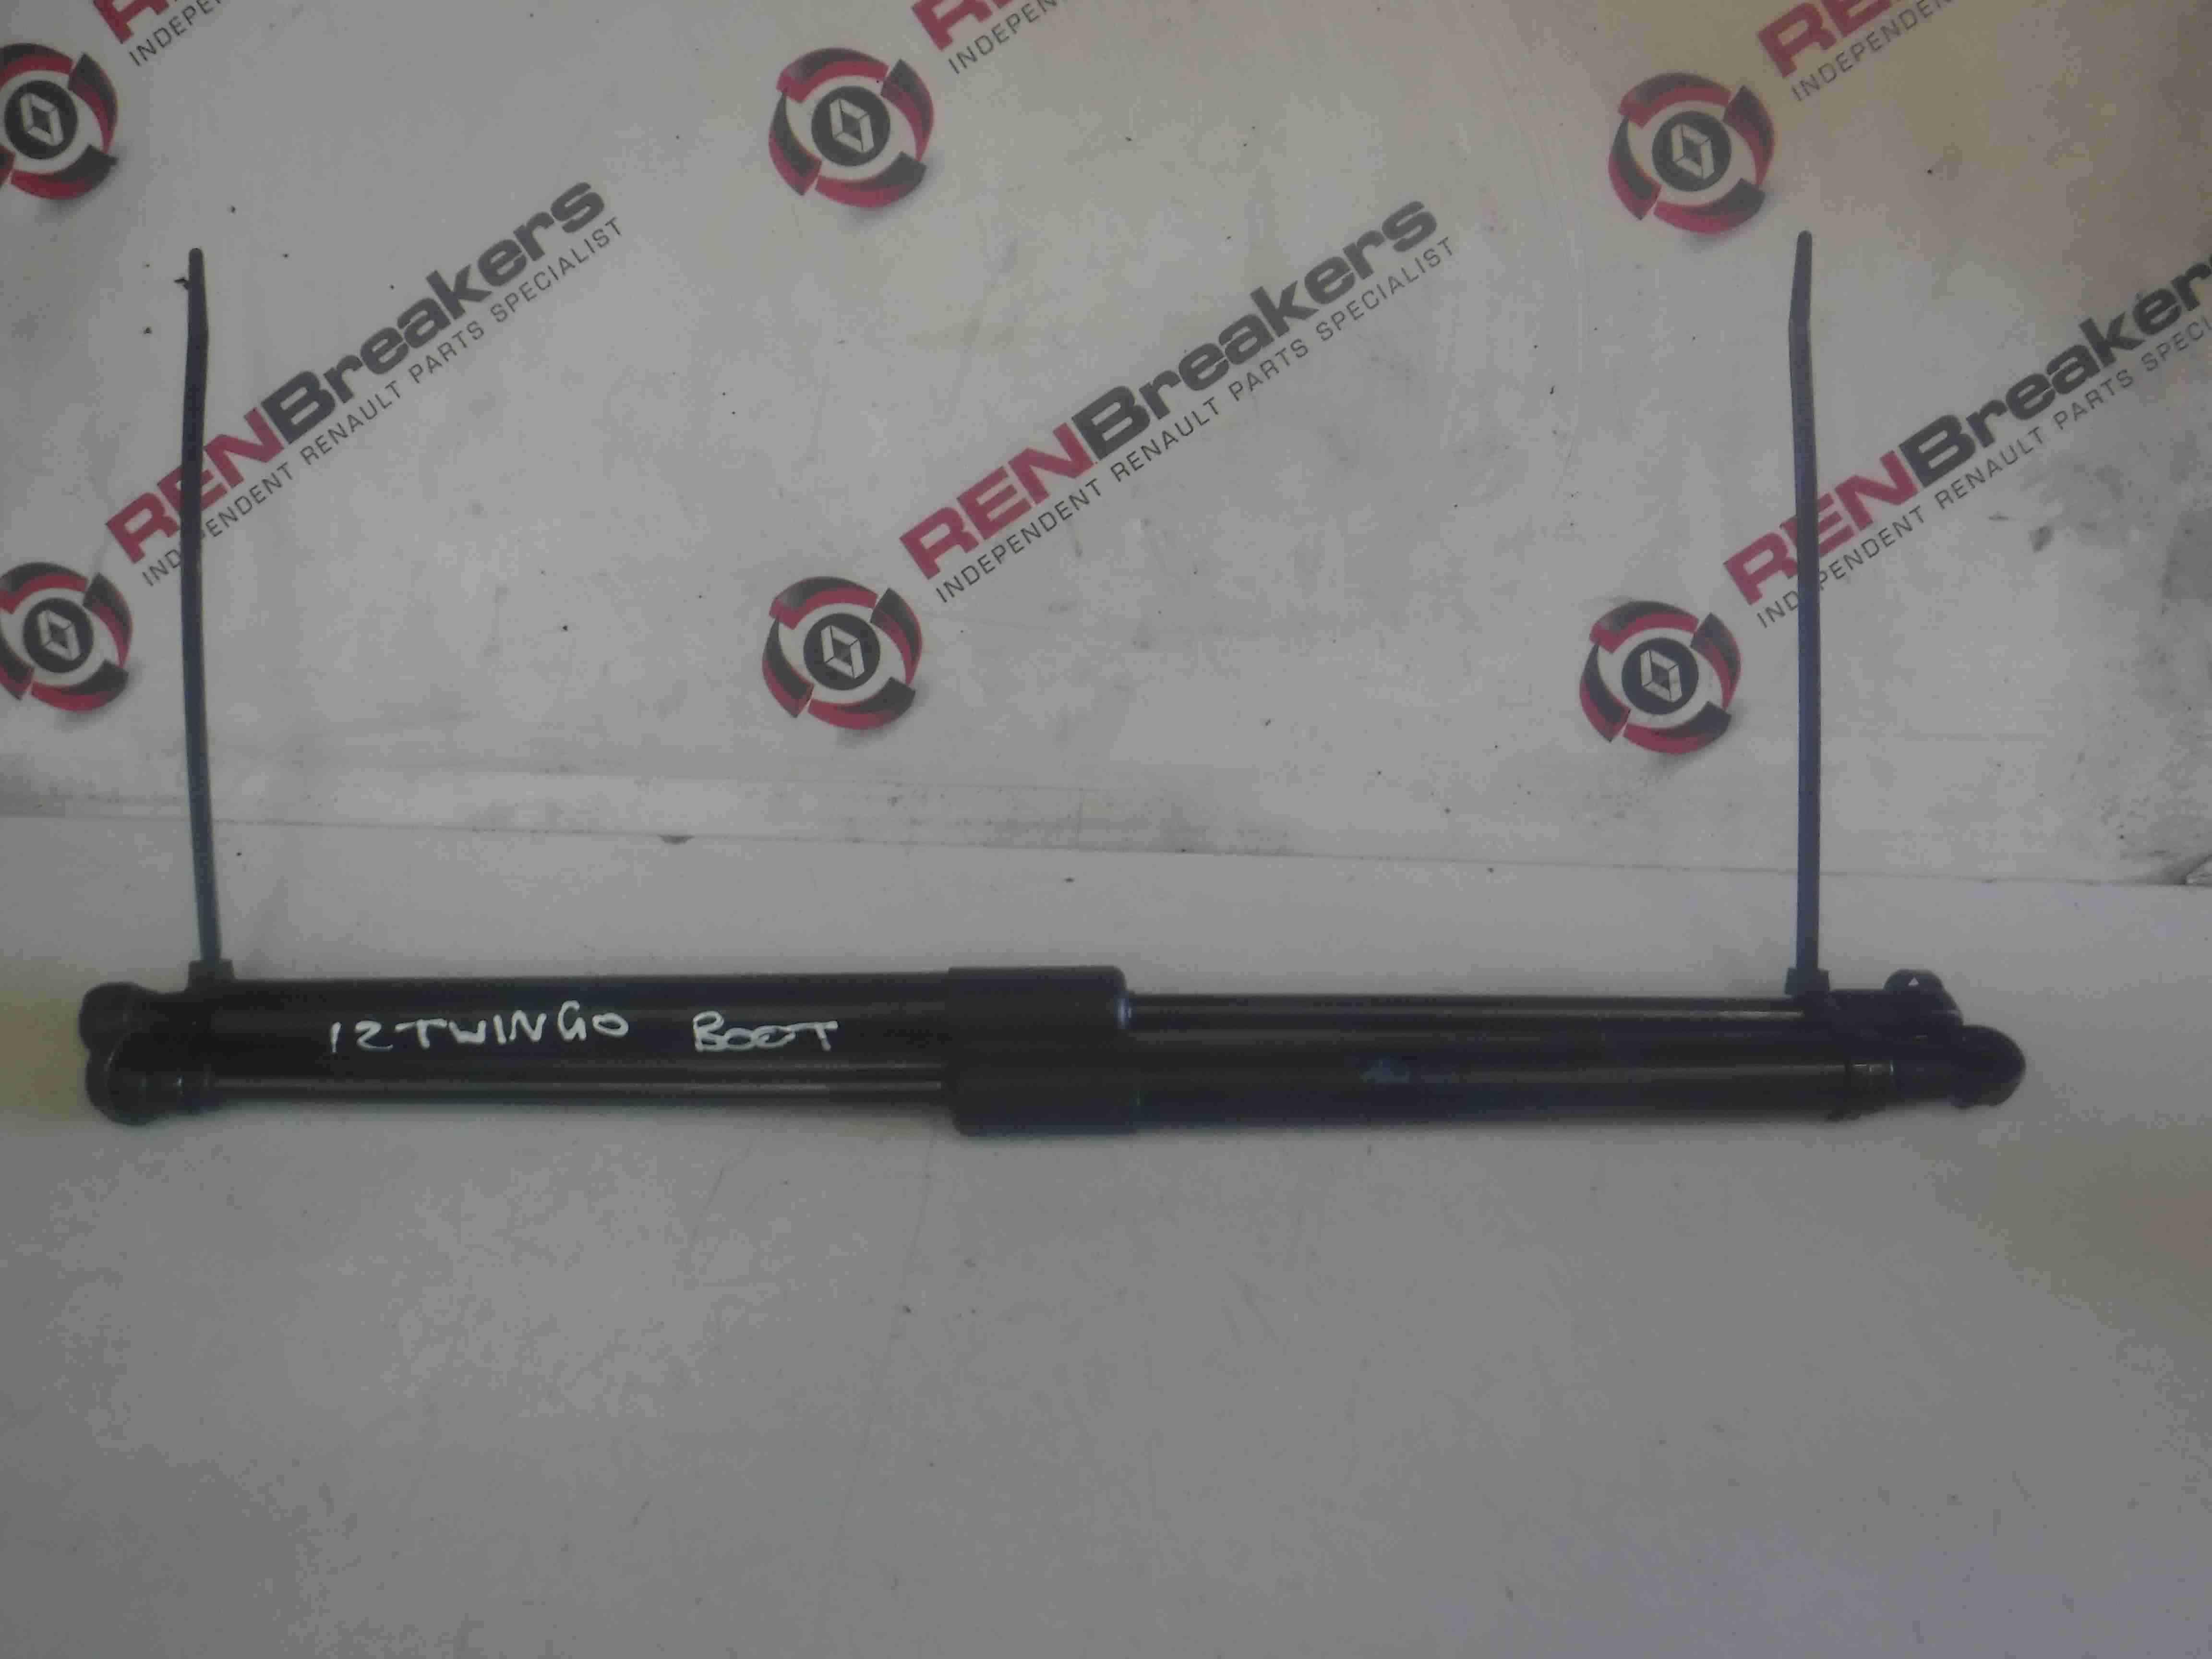 Renault Twingo 2011-2014 Boot Gas Struts X2 Pair